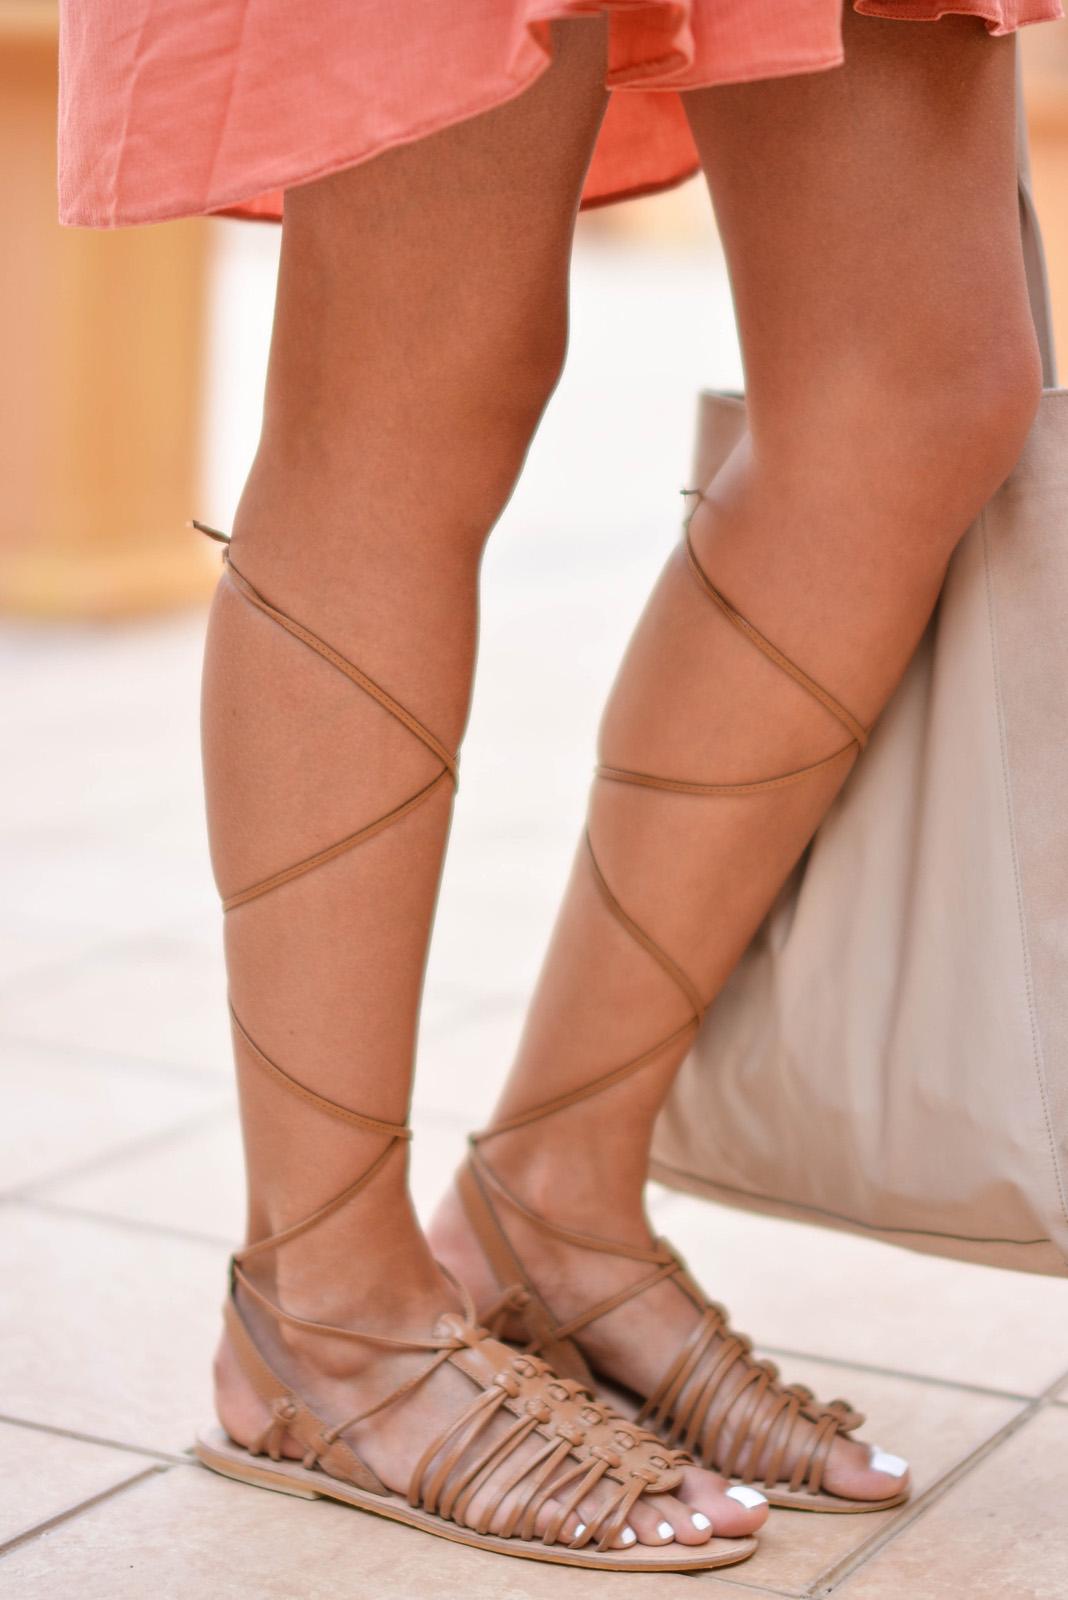 EJSTYLE - Emma Hill wears ASOS tan grecian gladiator sandals, ASOS beige suede bag, asseenonme